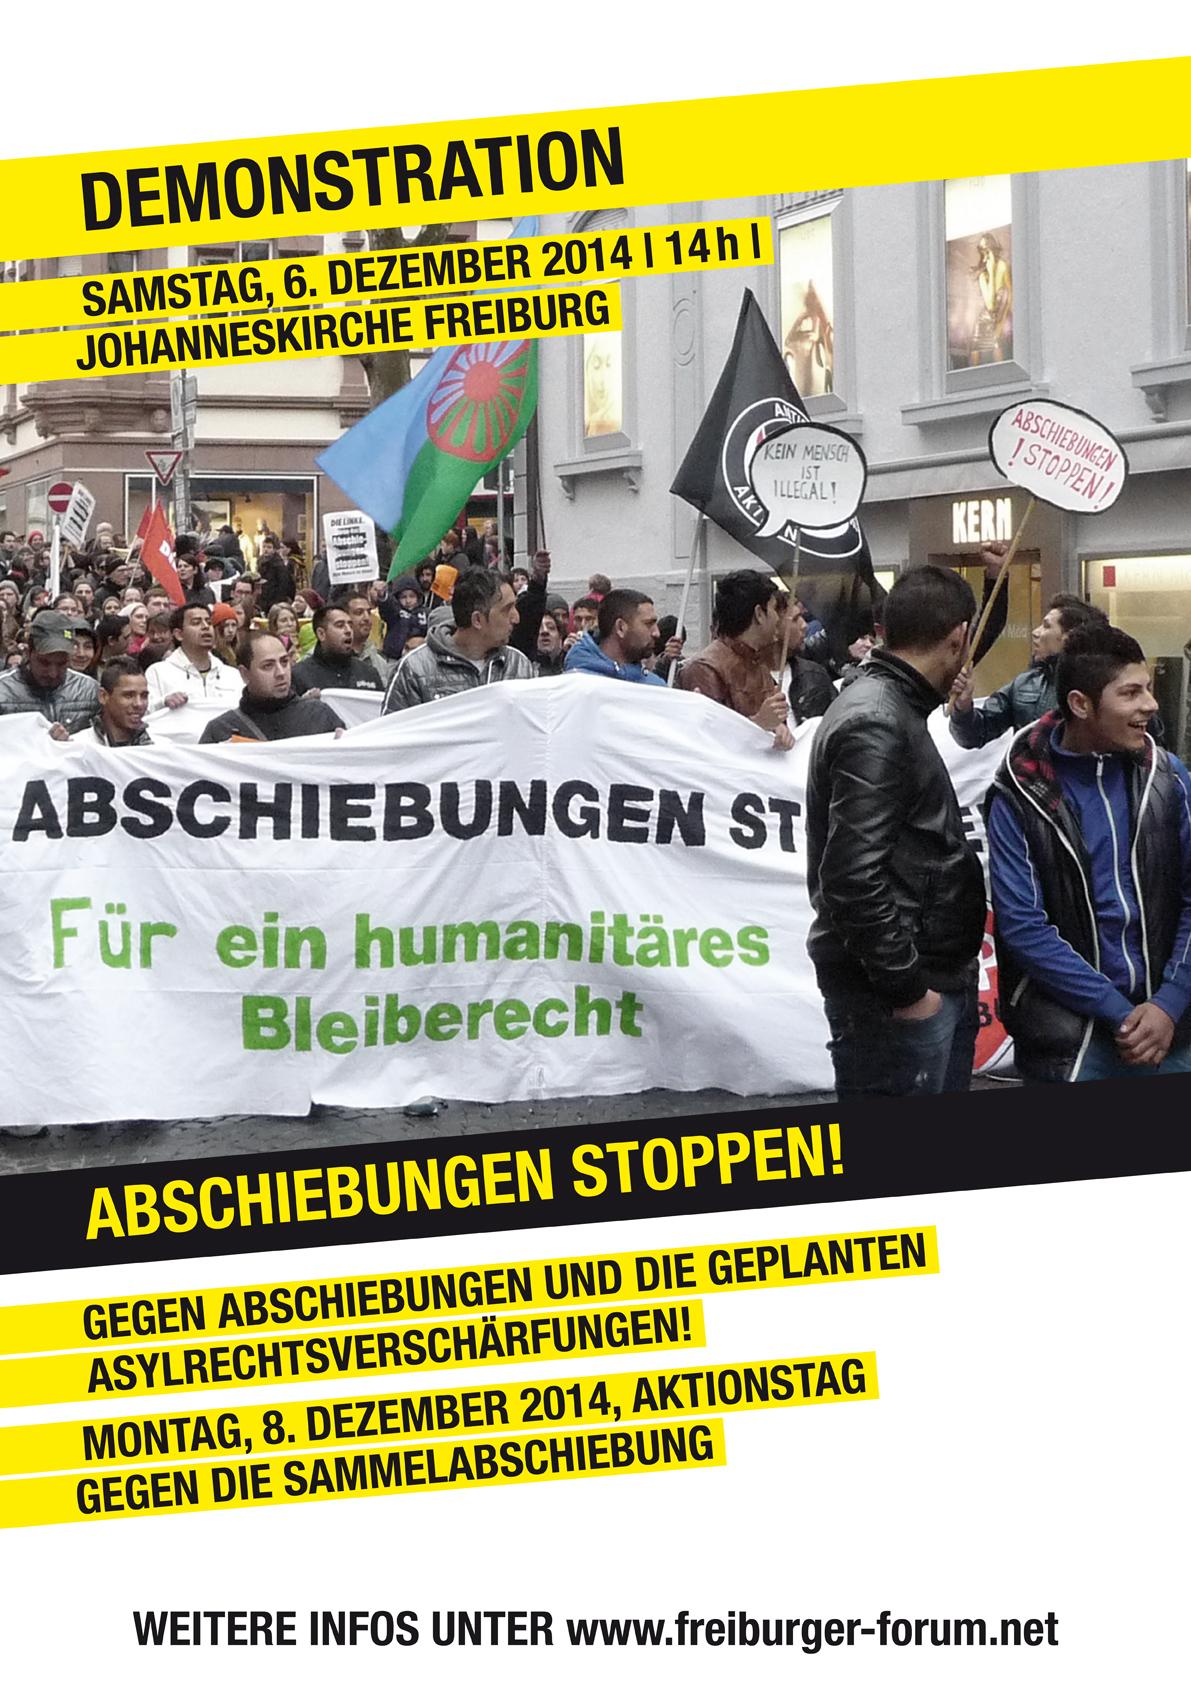 Plakat zur Demo am 6. Dezember